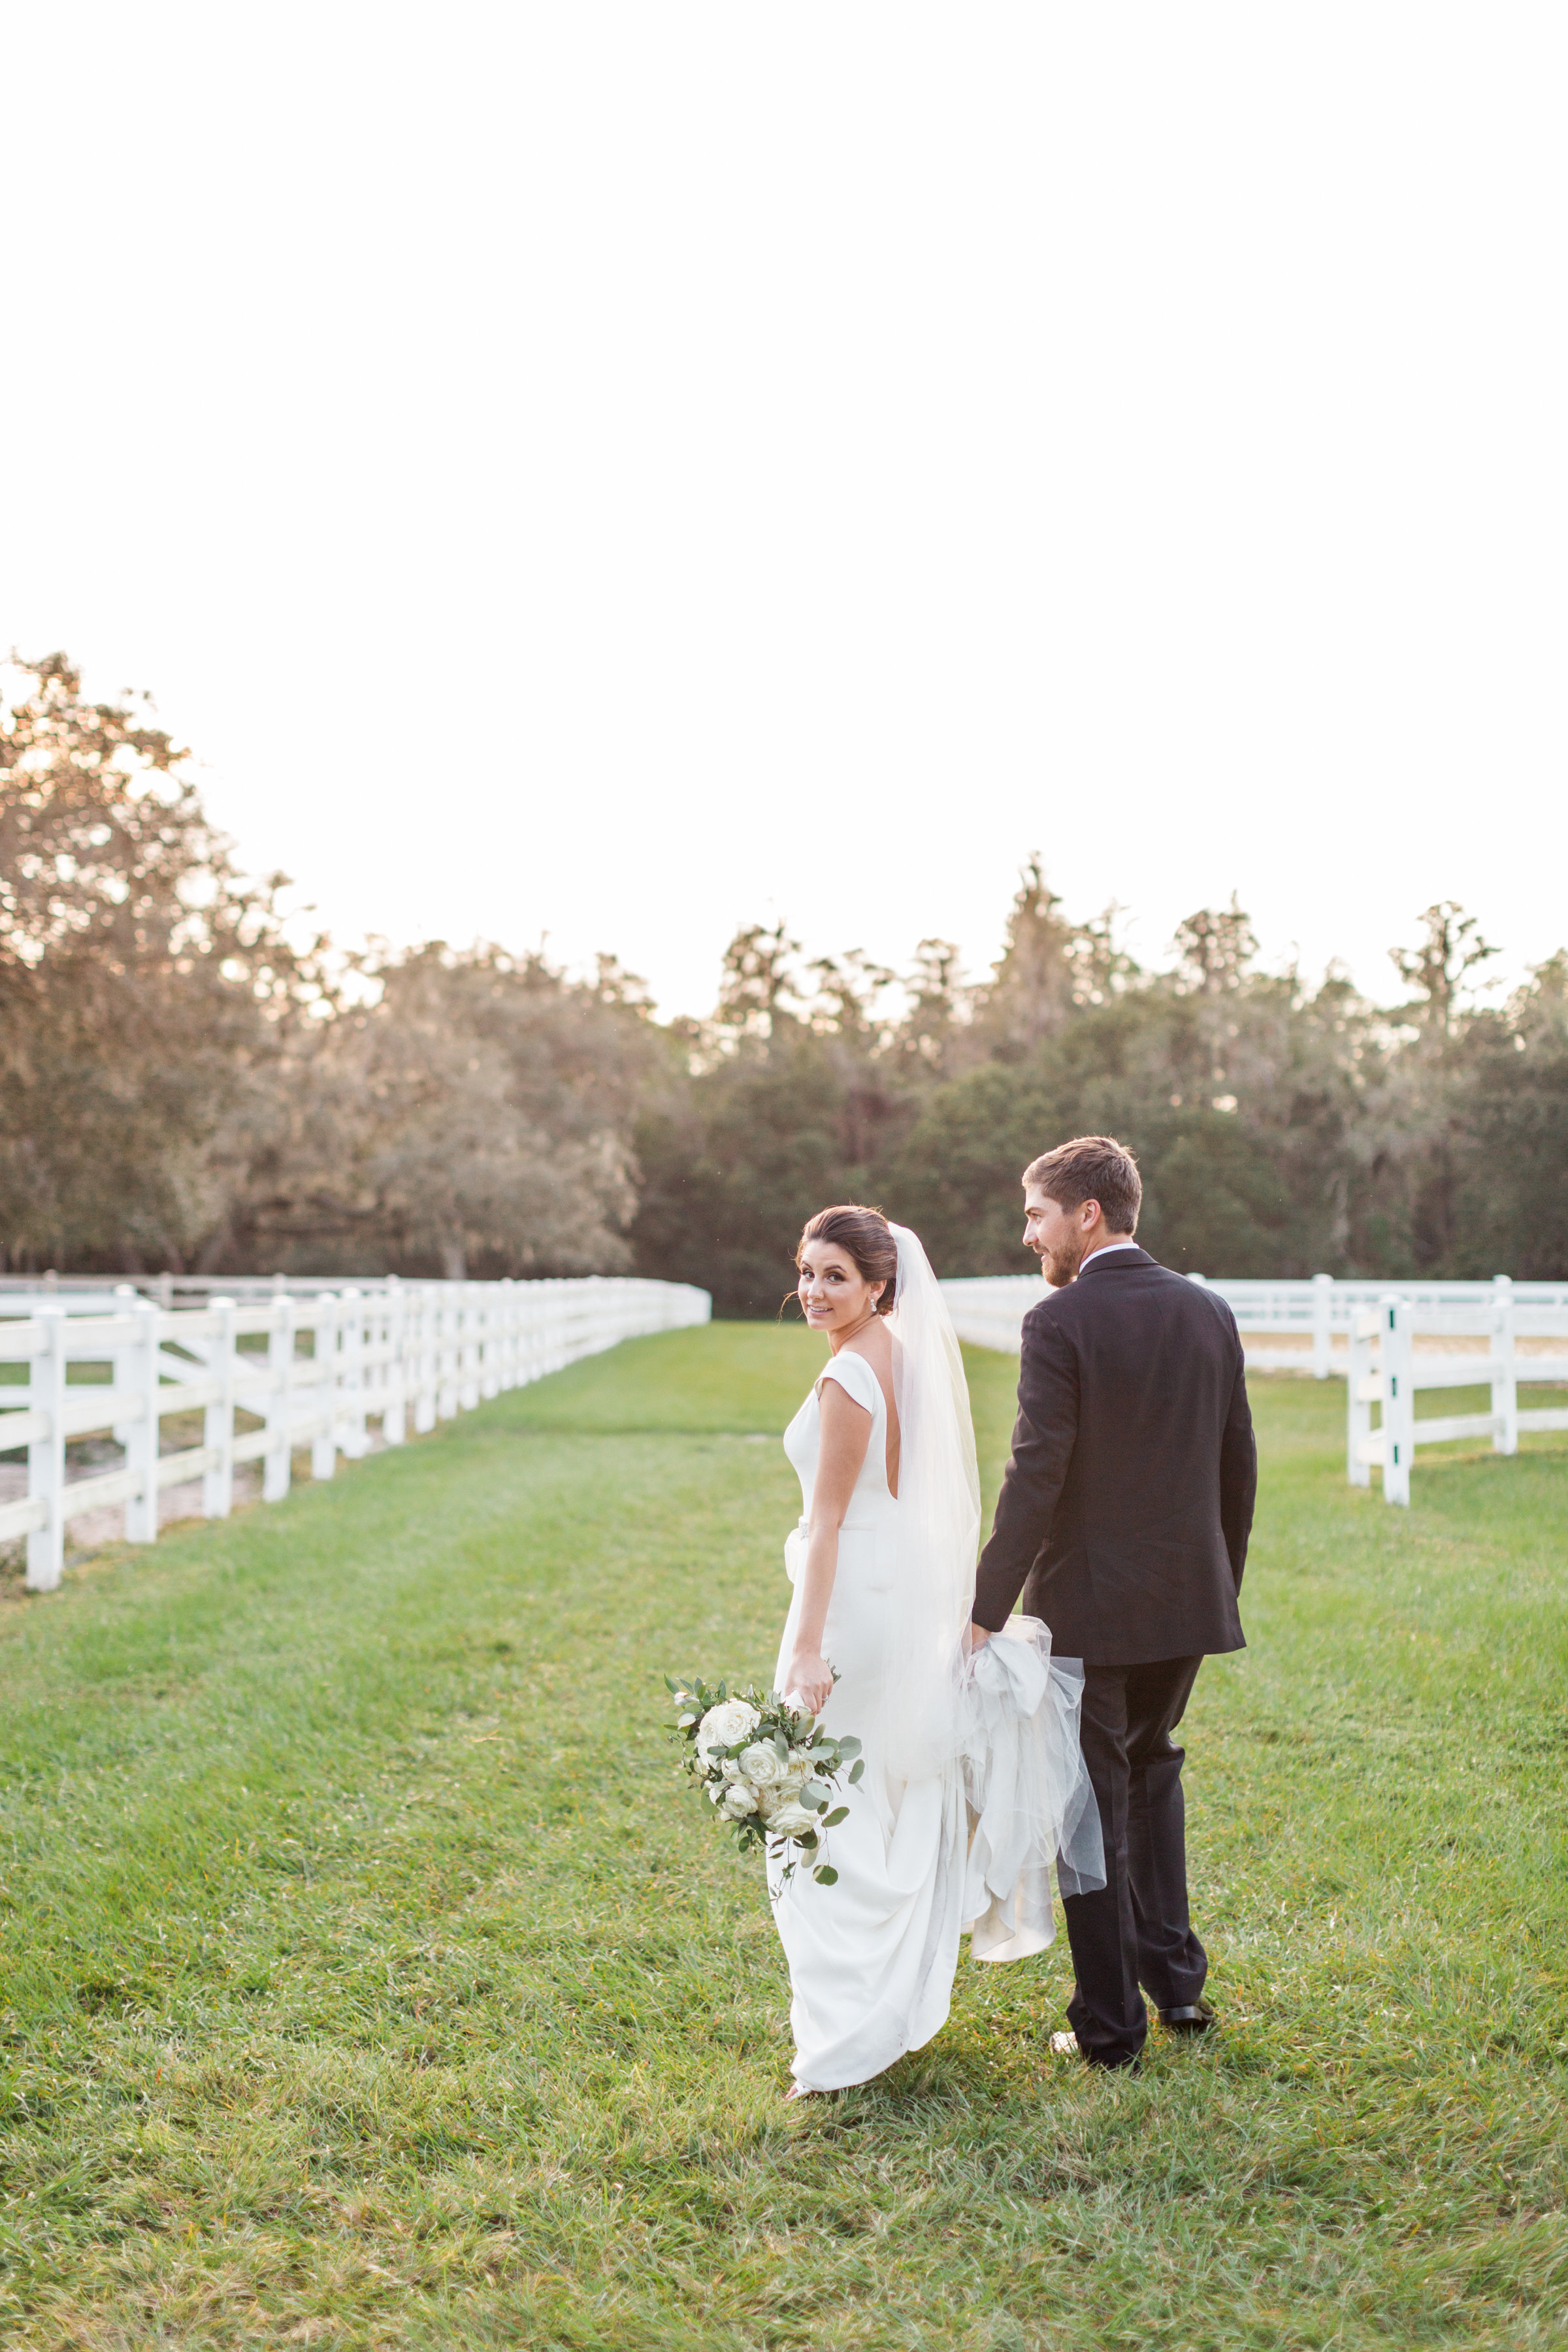 Monzy & Kenny's Wedding   Lauren Galloway Photography-581.jpg